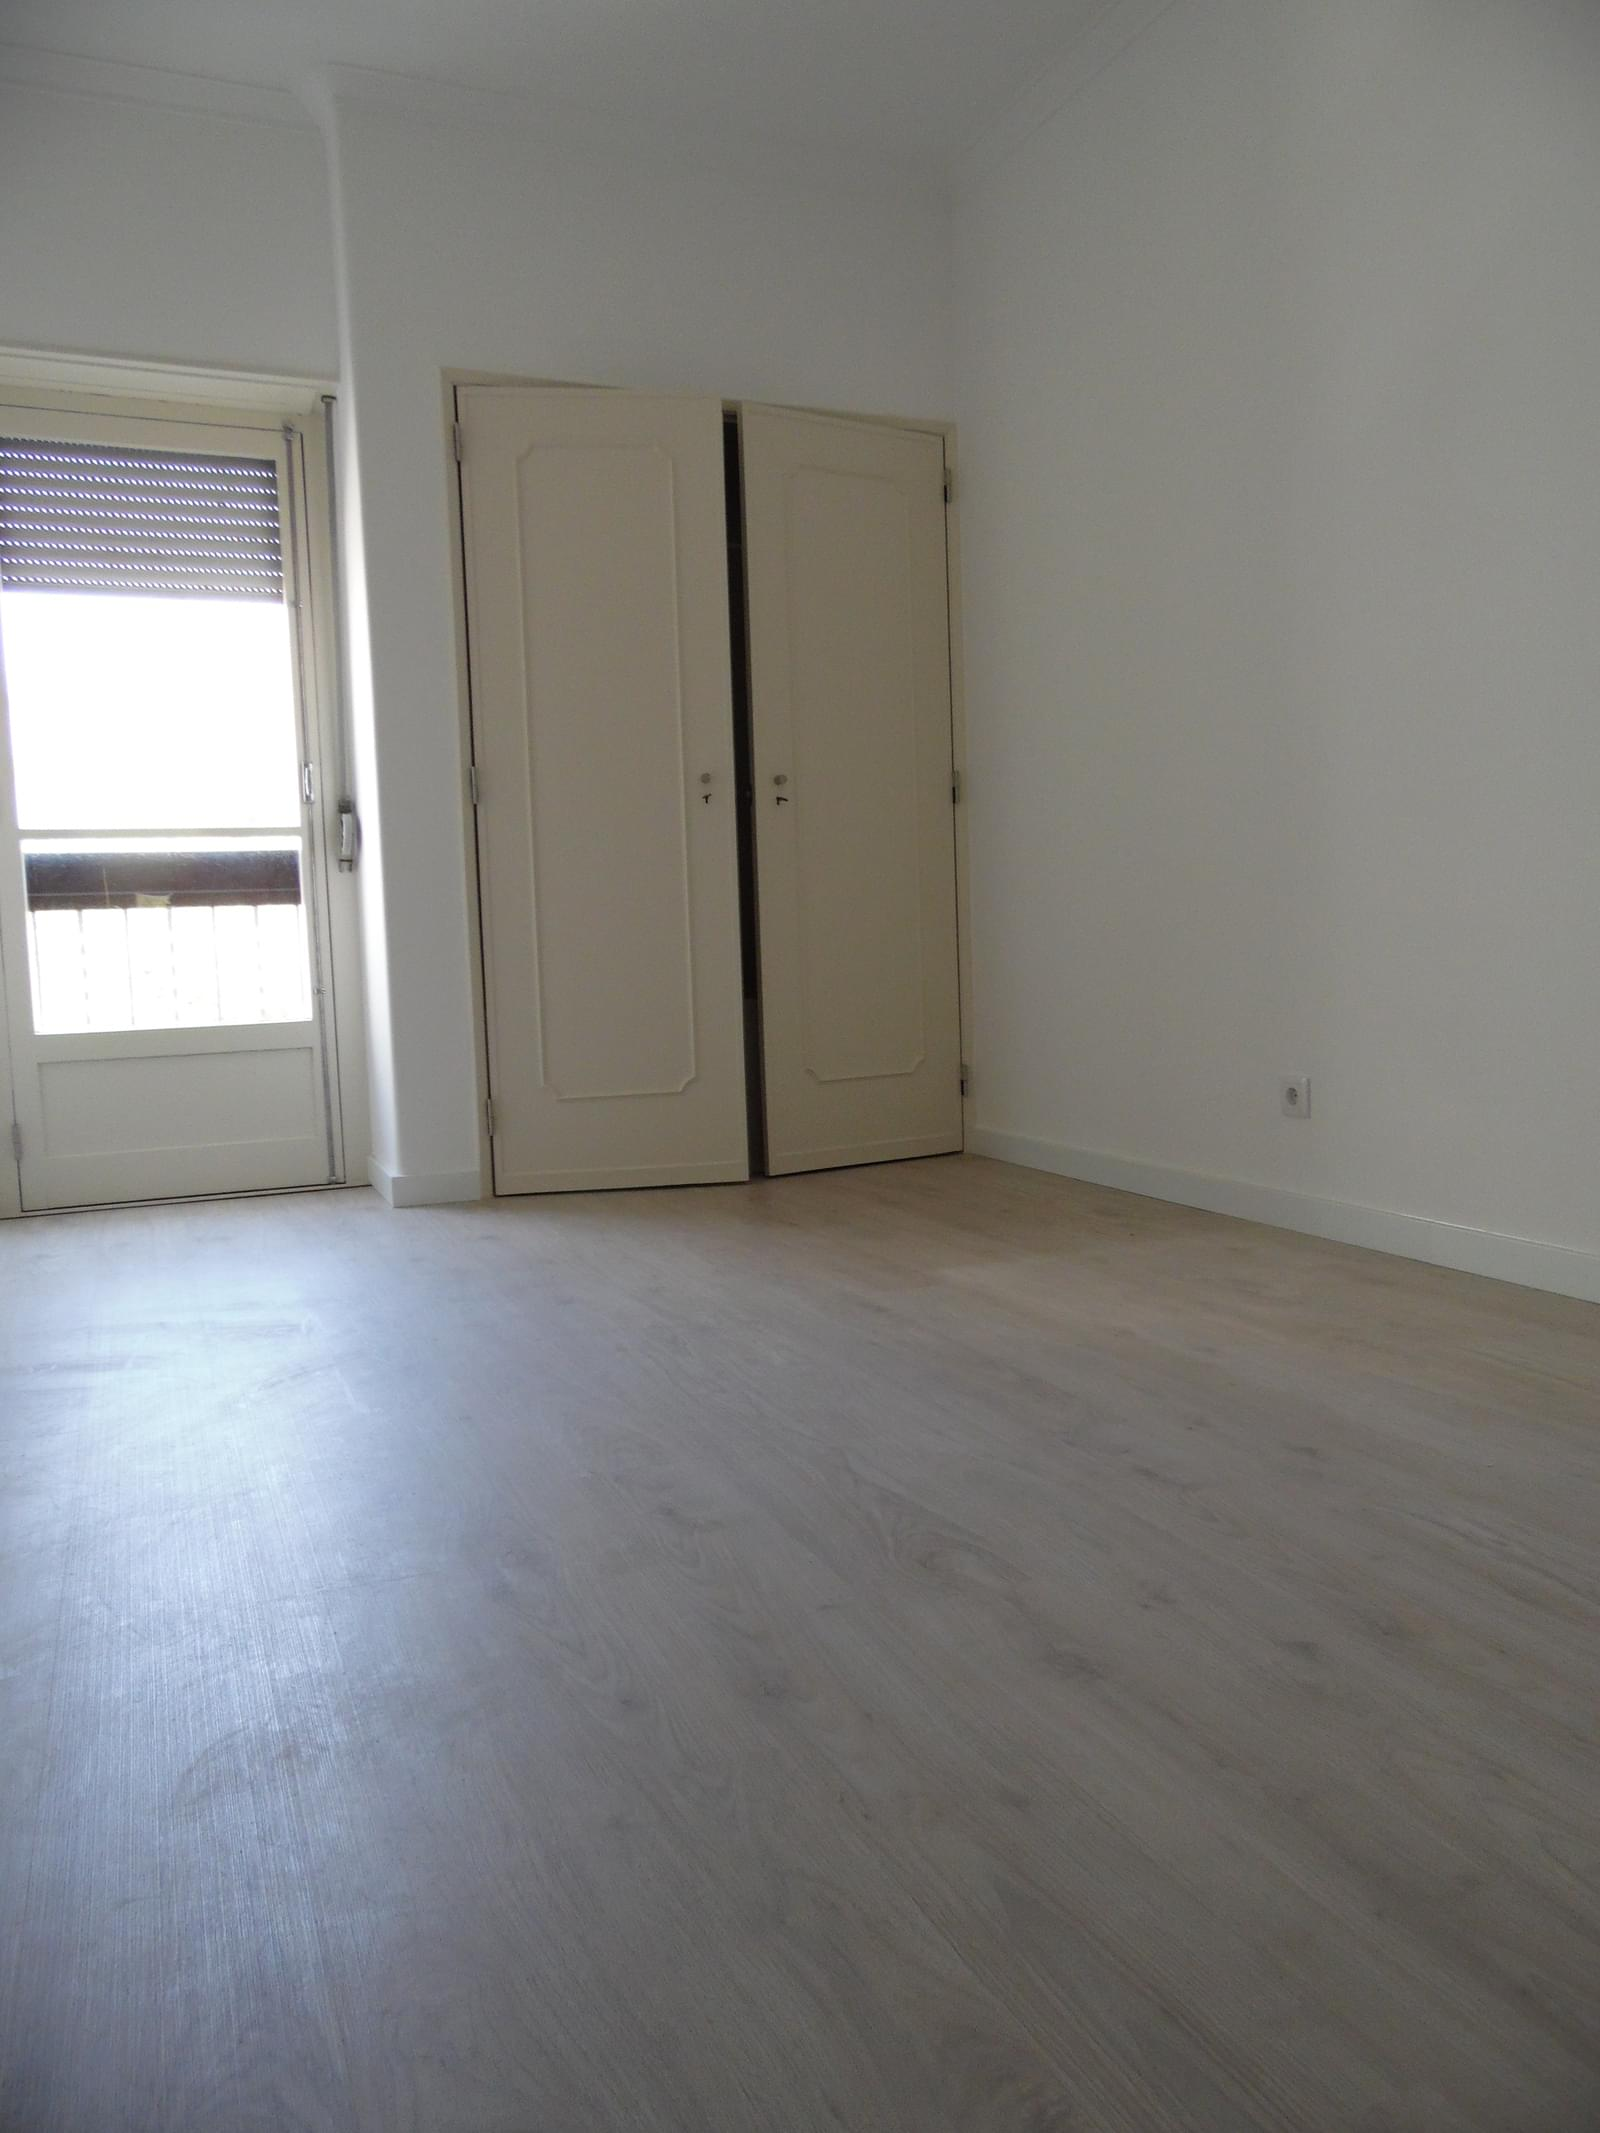 pf17195-apartamento-t3-oeiras-fa729a48-eb2a-44e1-8c4d-918df0bfe8af